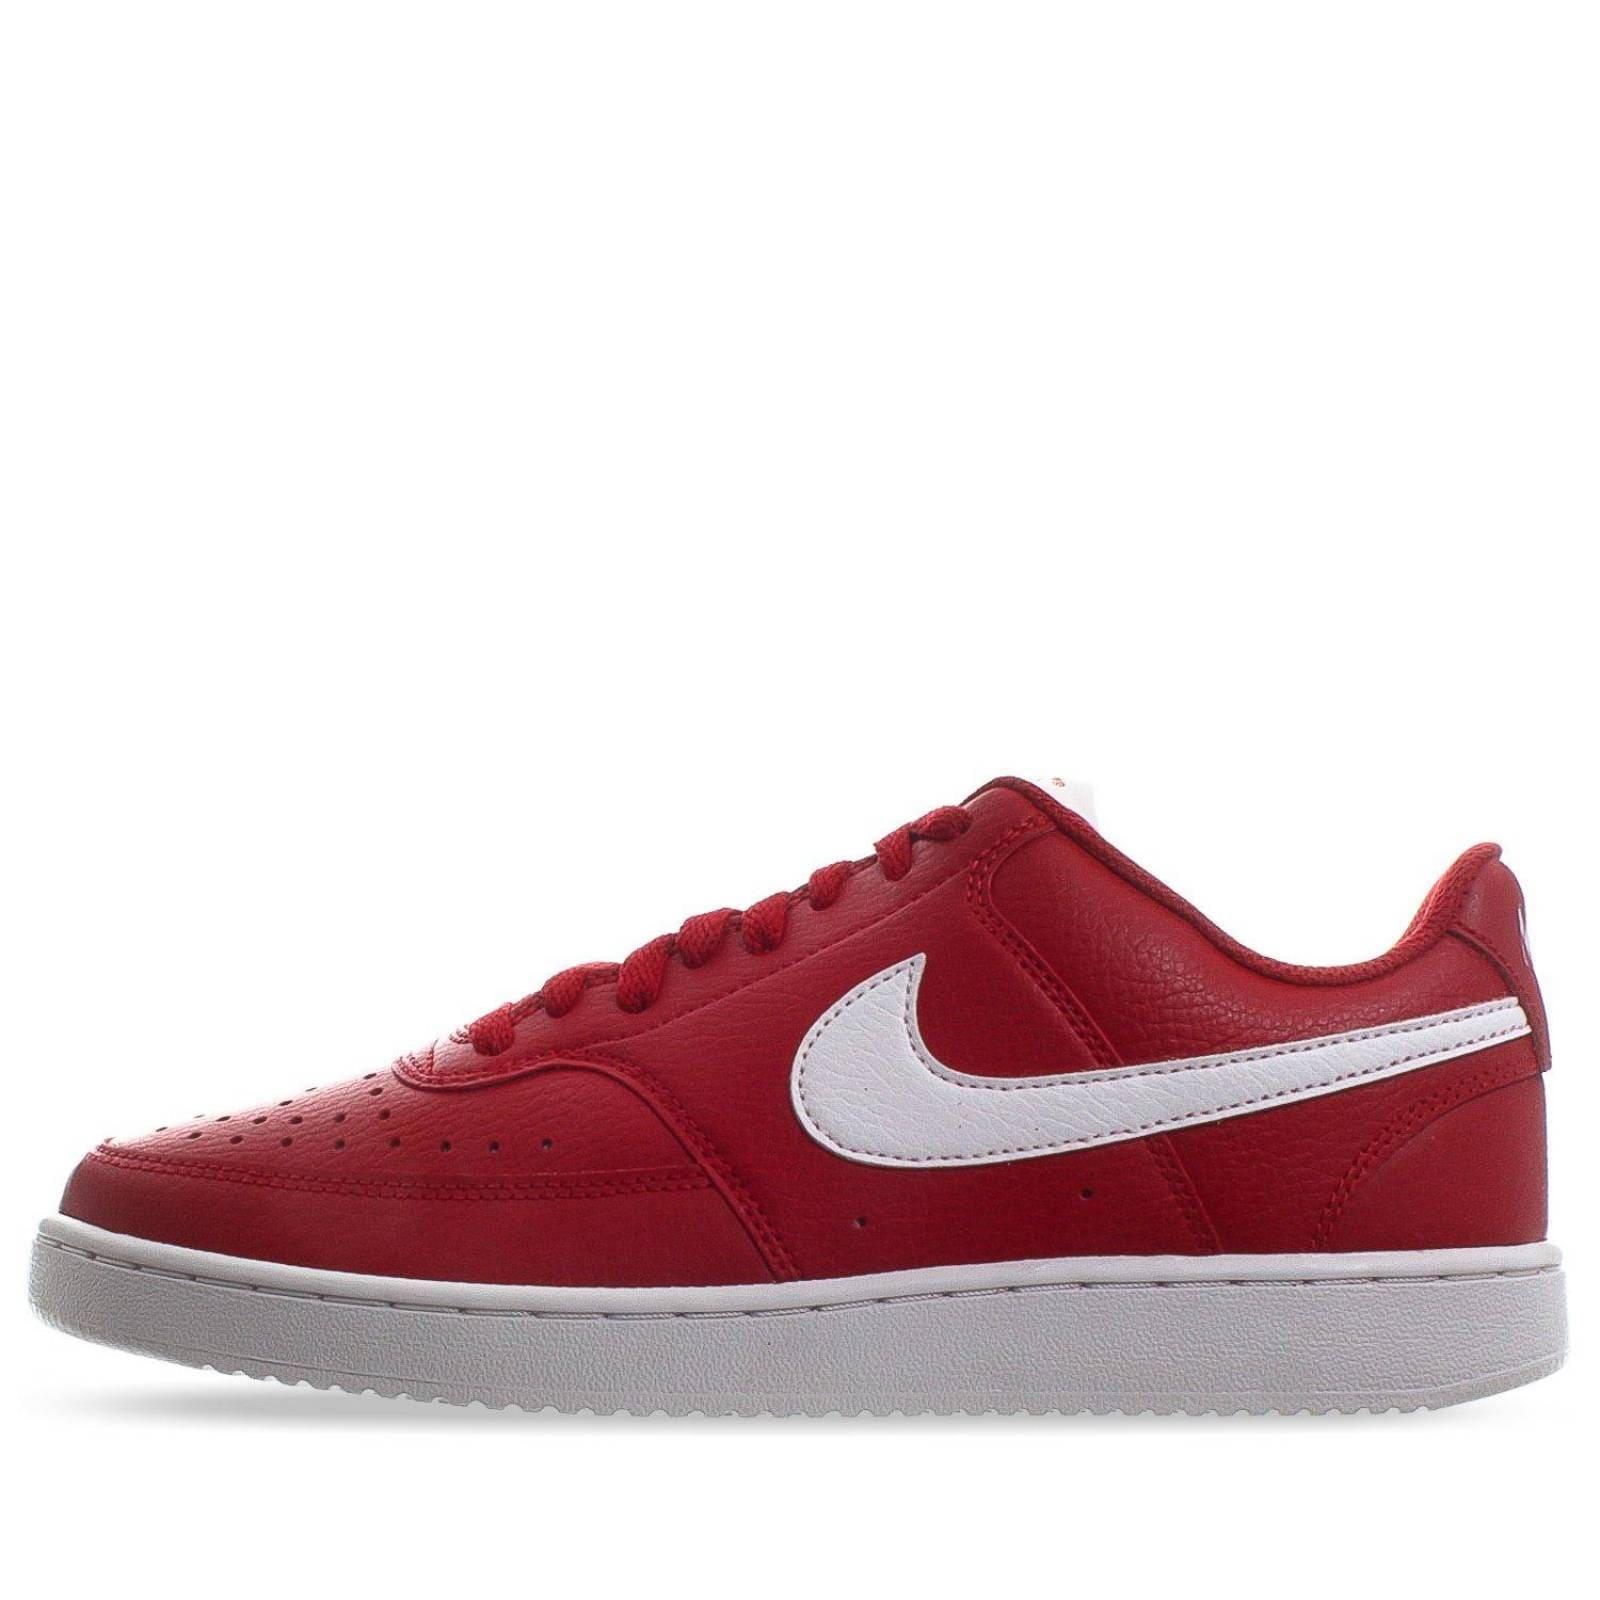 Tenis Nike Court Vision Low - CD5463600 - Rojo - Hombre